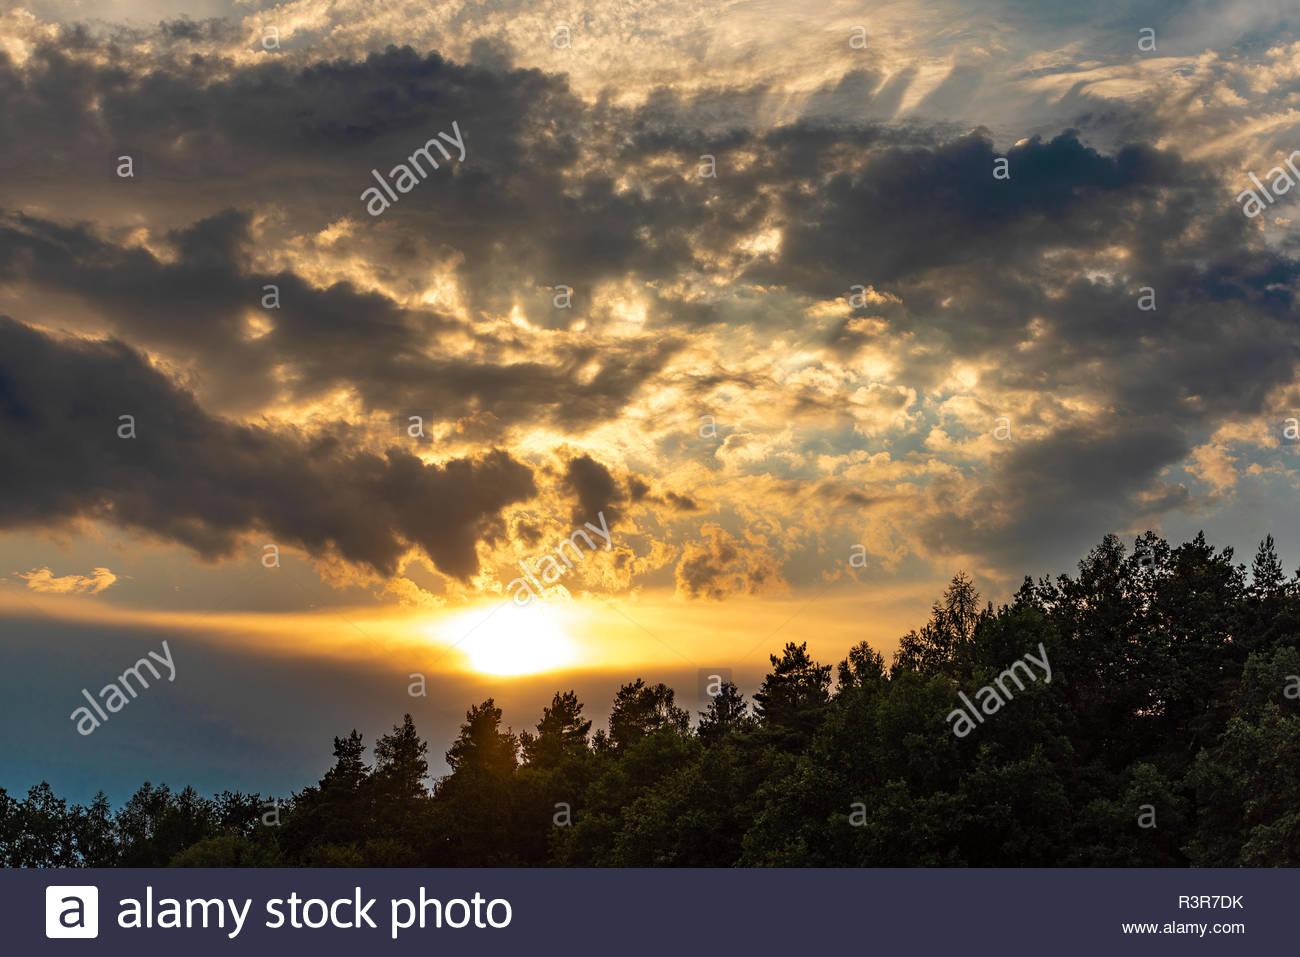 Sonnenuntergang über dem Wald - Stock Image